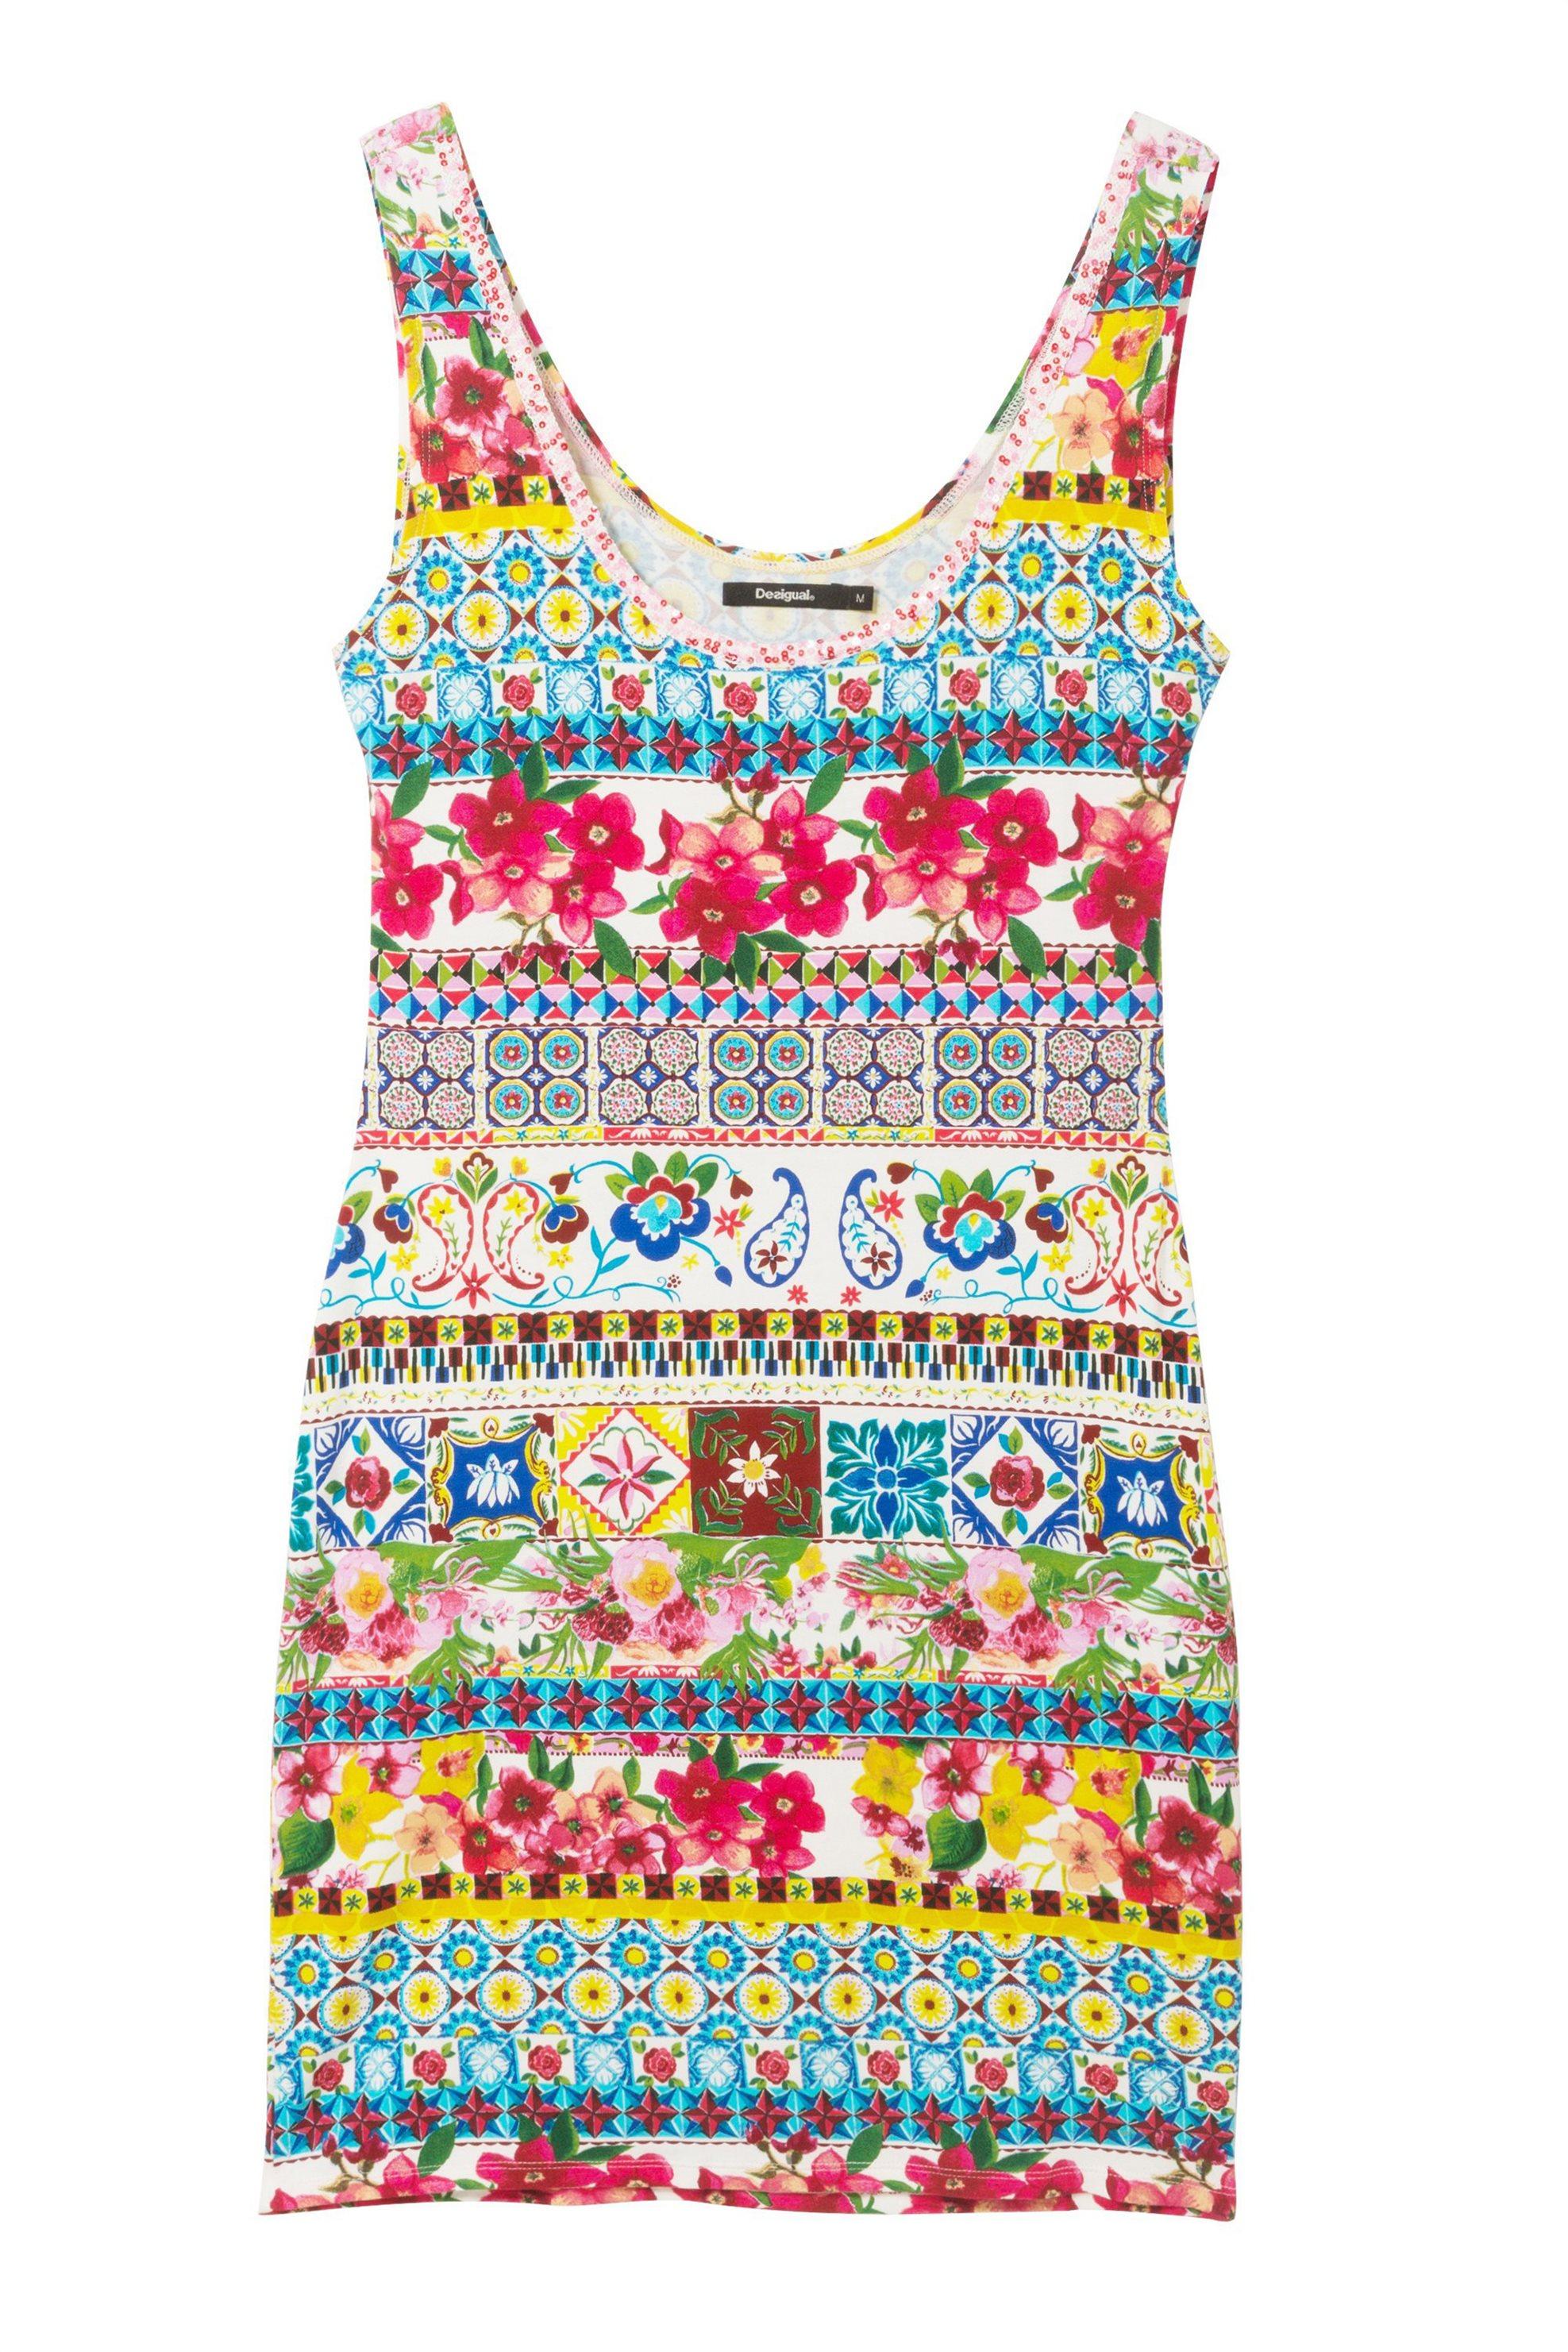 b40b1f05e786 Notos Γυναικείο φόρεμα Luana Desigual - 18SWVK23 - Πολύχρωμο